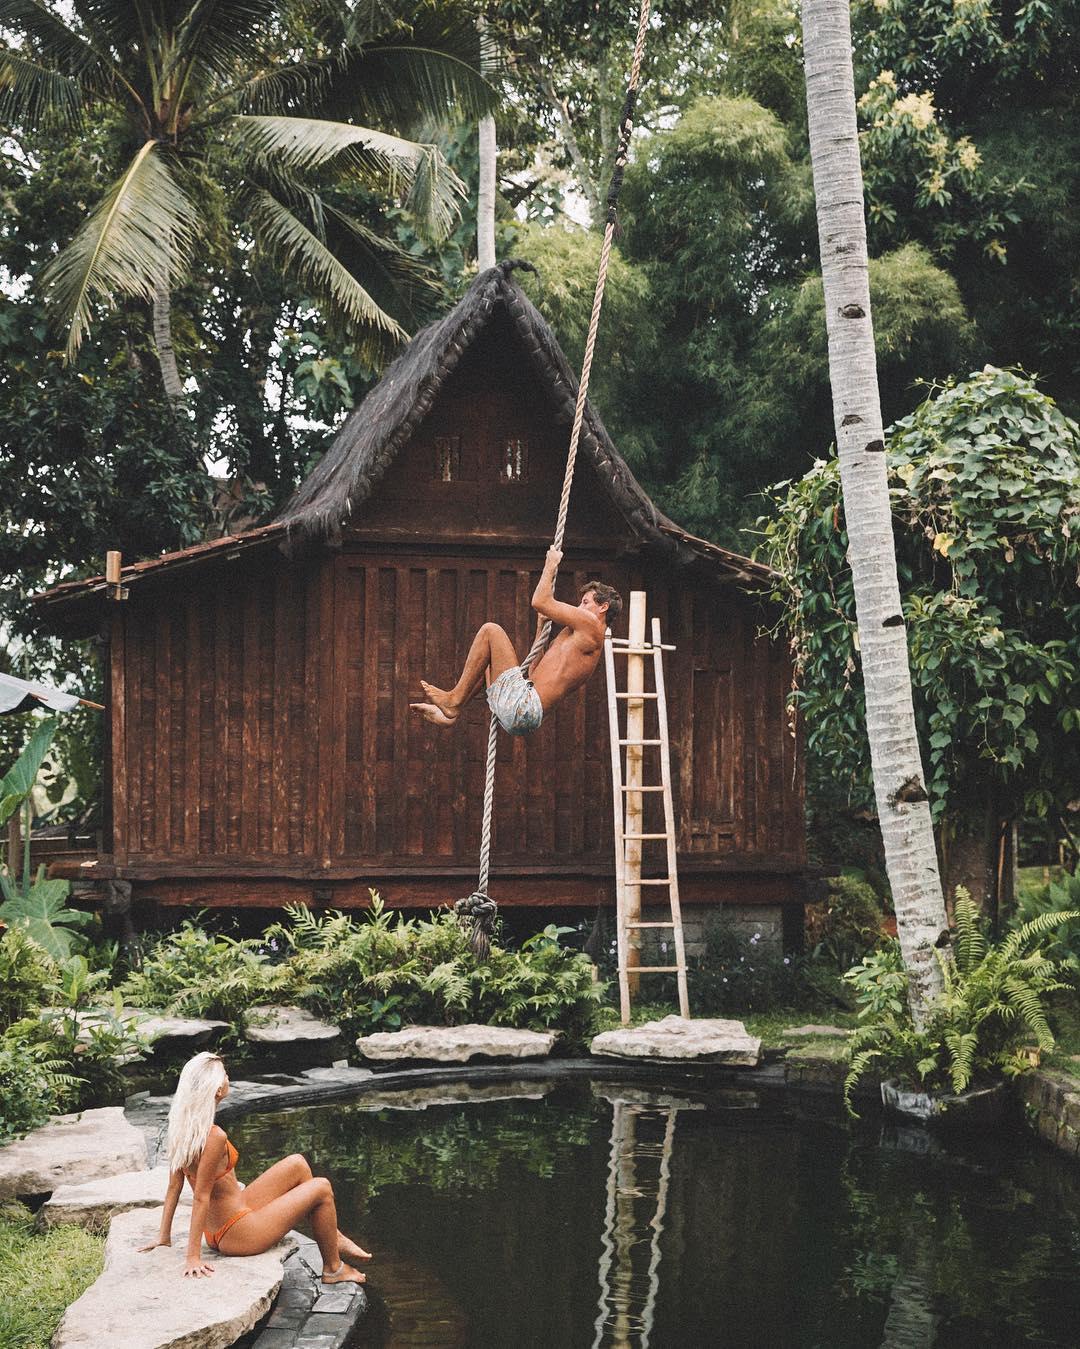 coppia-guadagna-viaggiando-foto-instagram-jack-morris-lauren-bullen-01